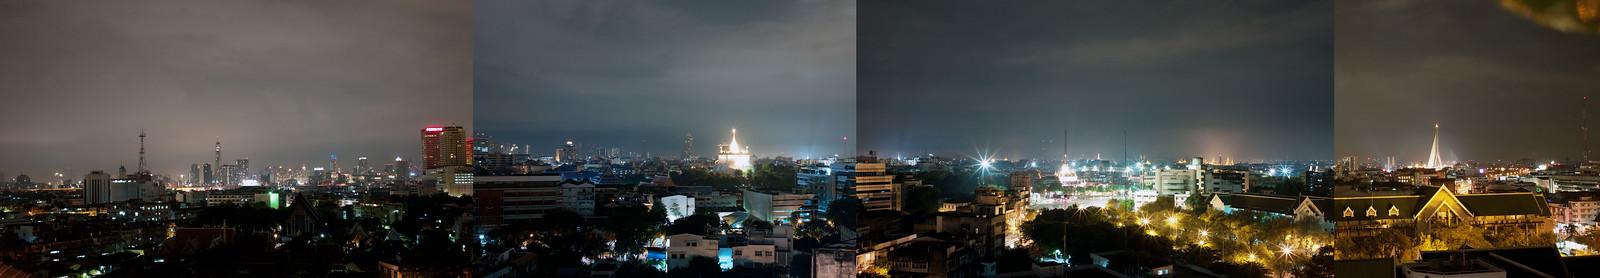 Bangkok (2010)